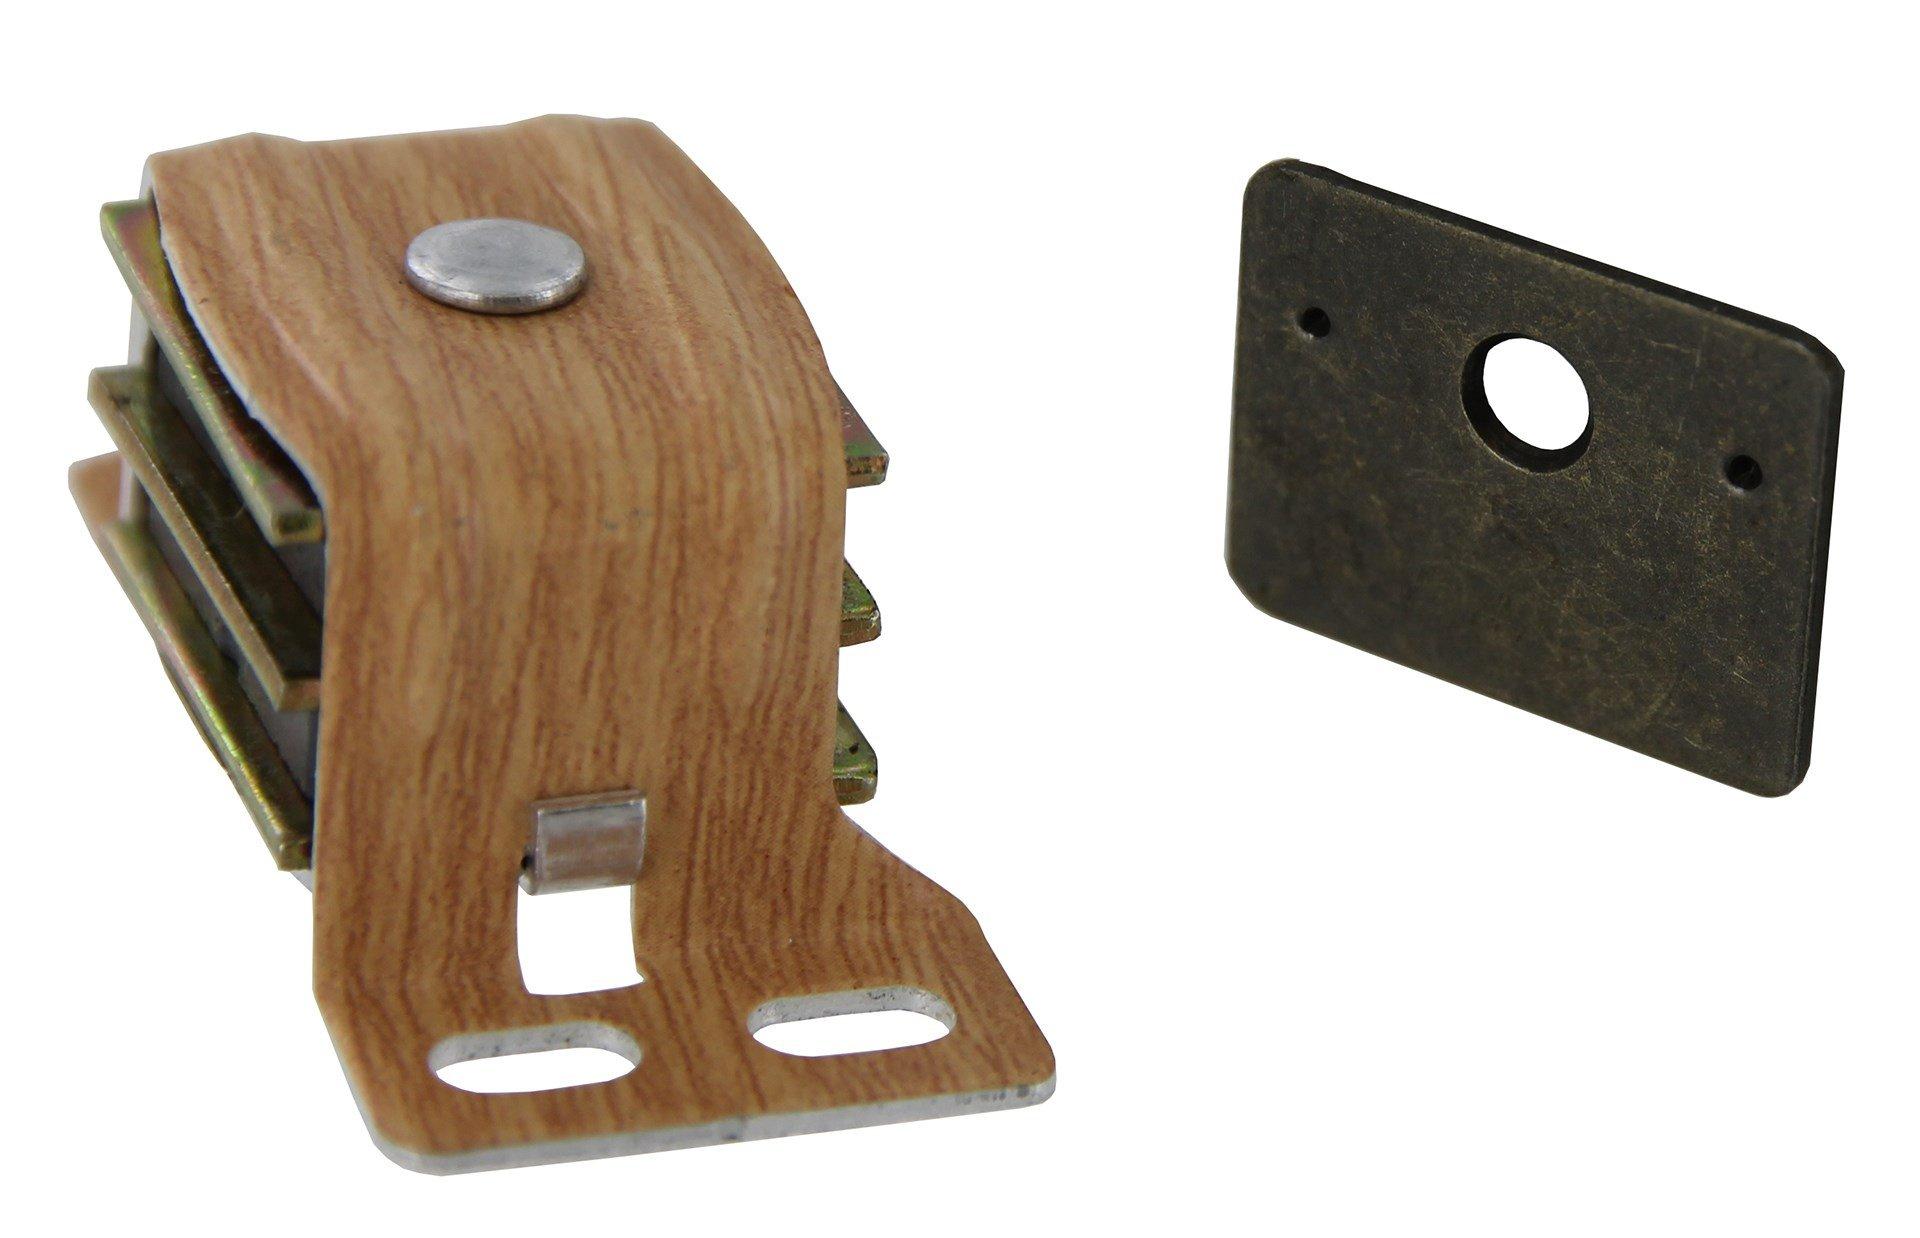 Amerock BP9798AW 1'' Wood Grain Finish Magnetic Catch